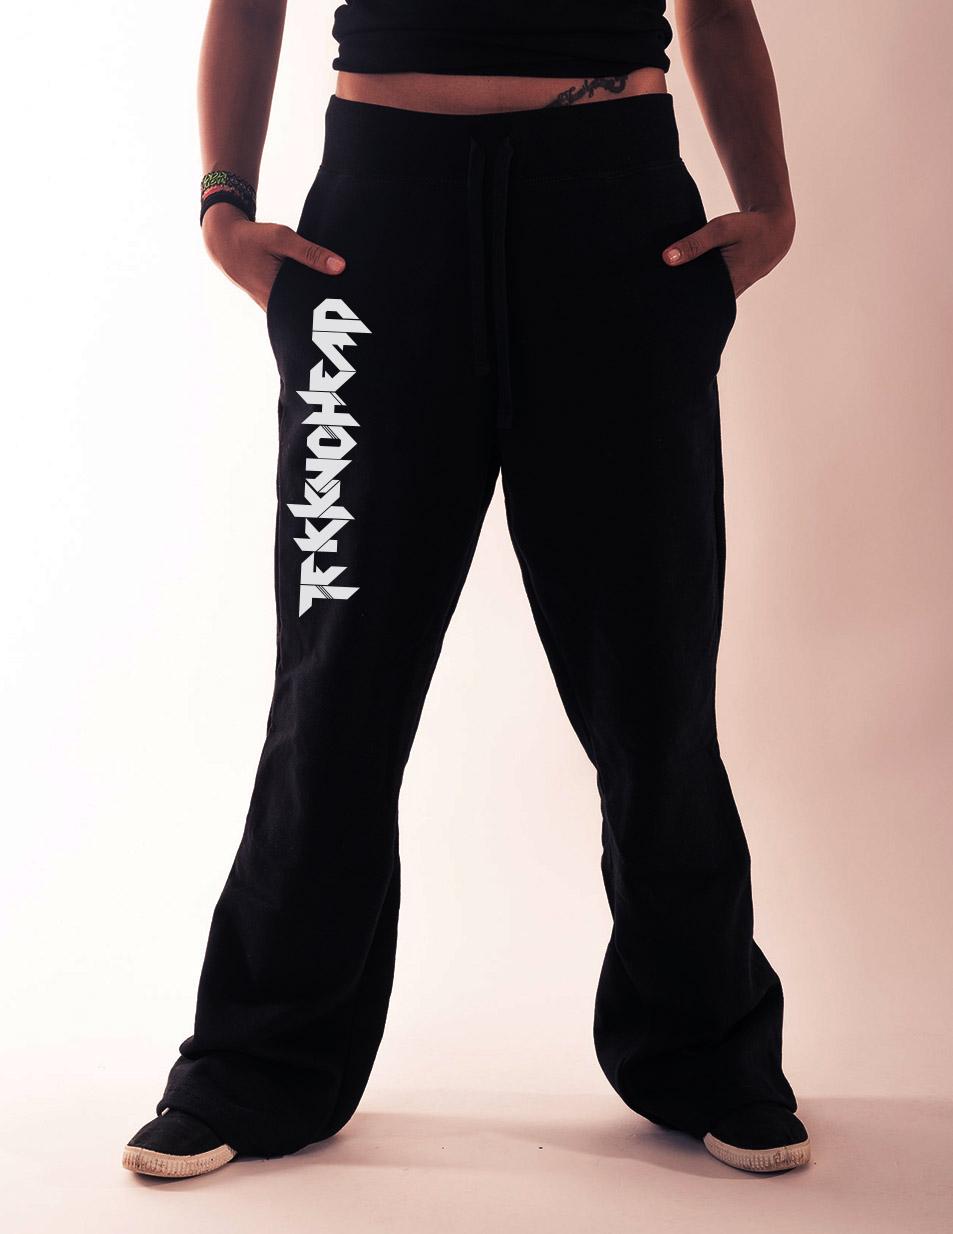 Damen-Jogginghose Tekknohead silber auf schwarz